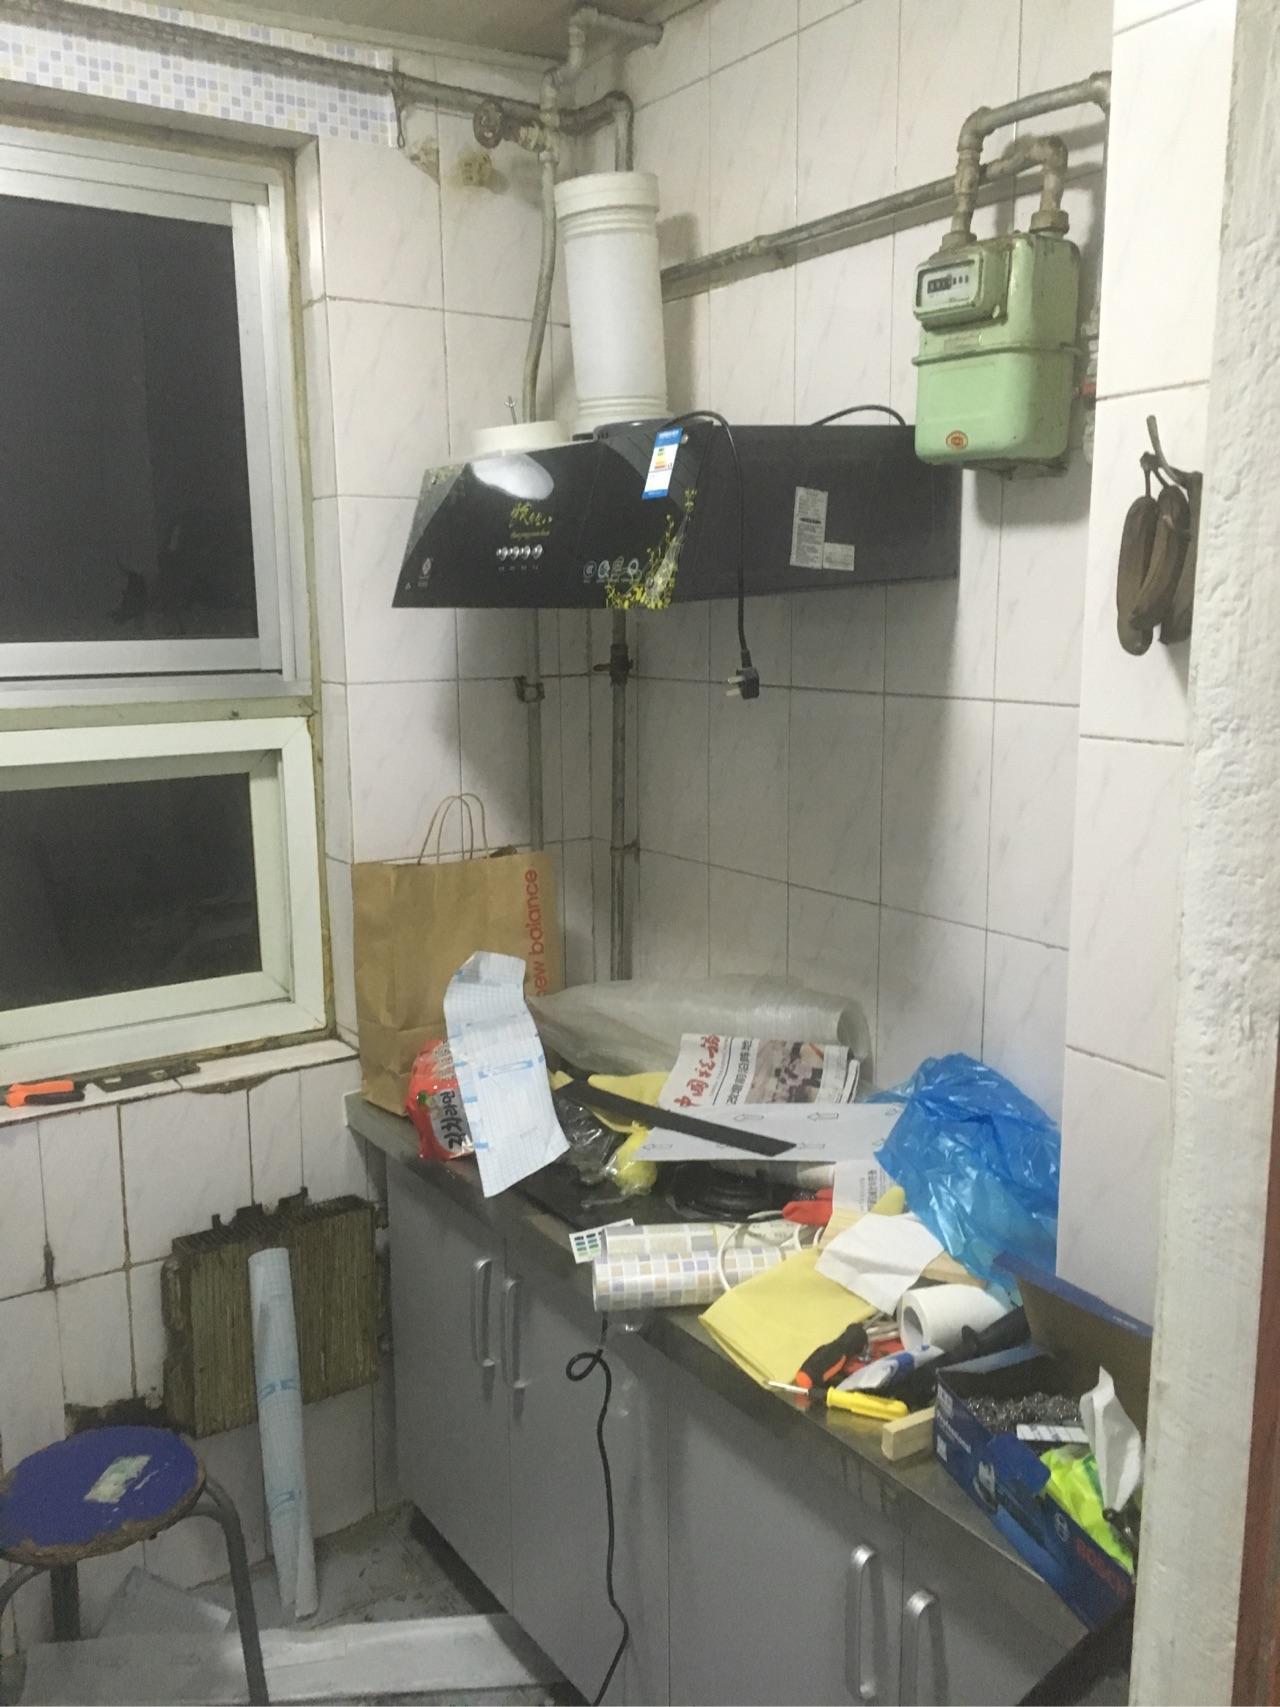 kitchen corner shelf cement sink 怎么花最少的钱提升出租屋的格调? - 知乎